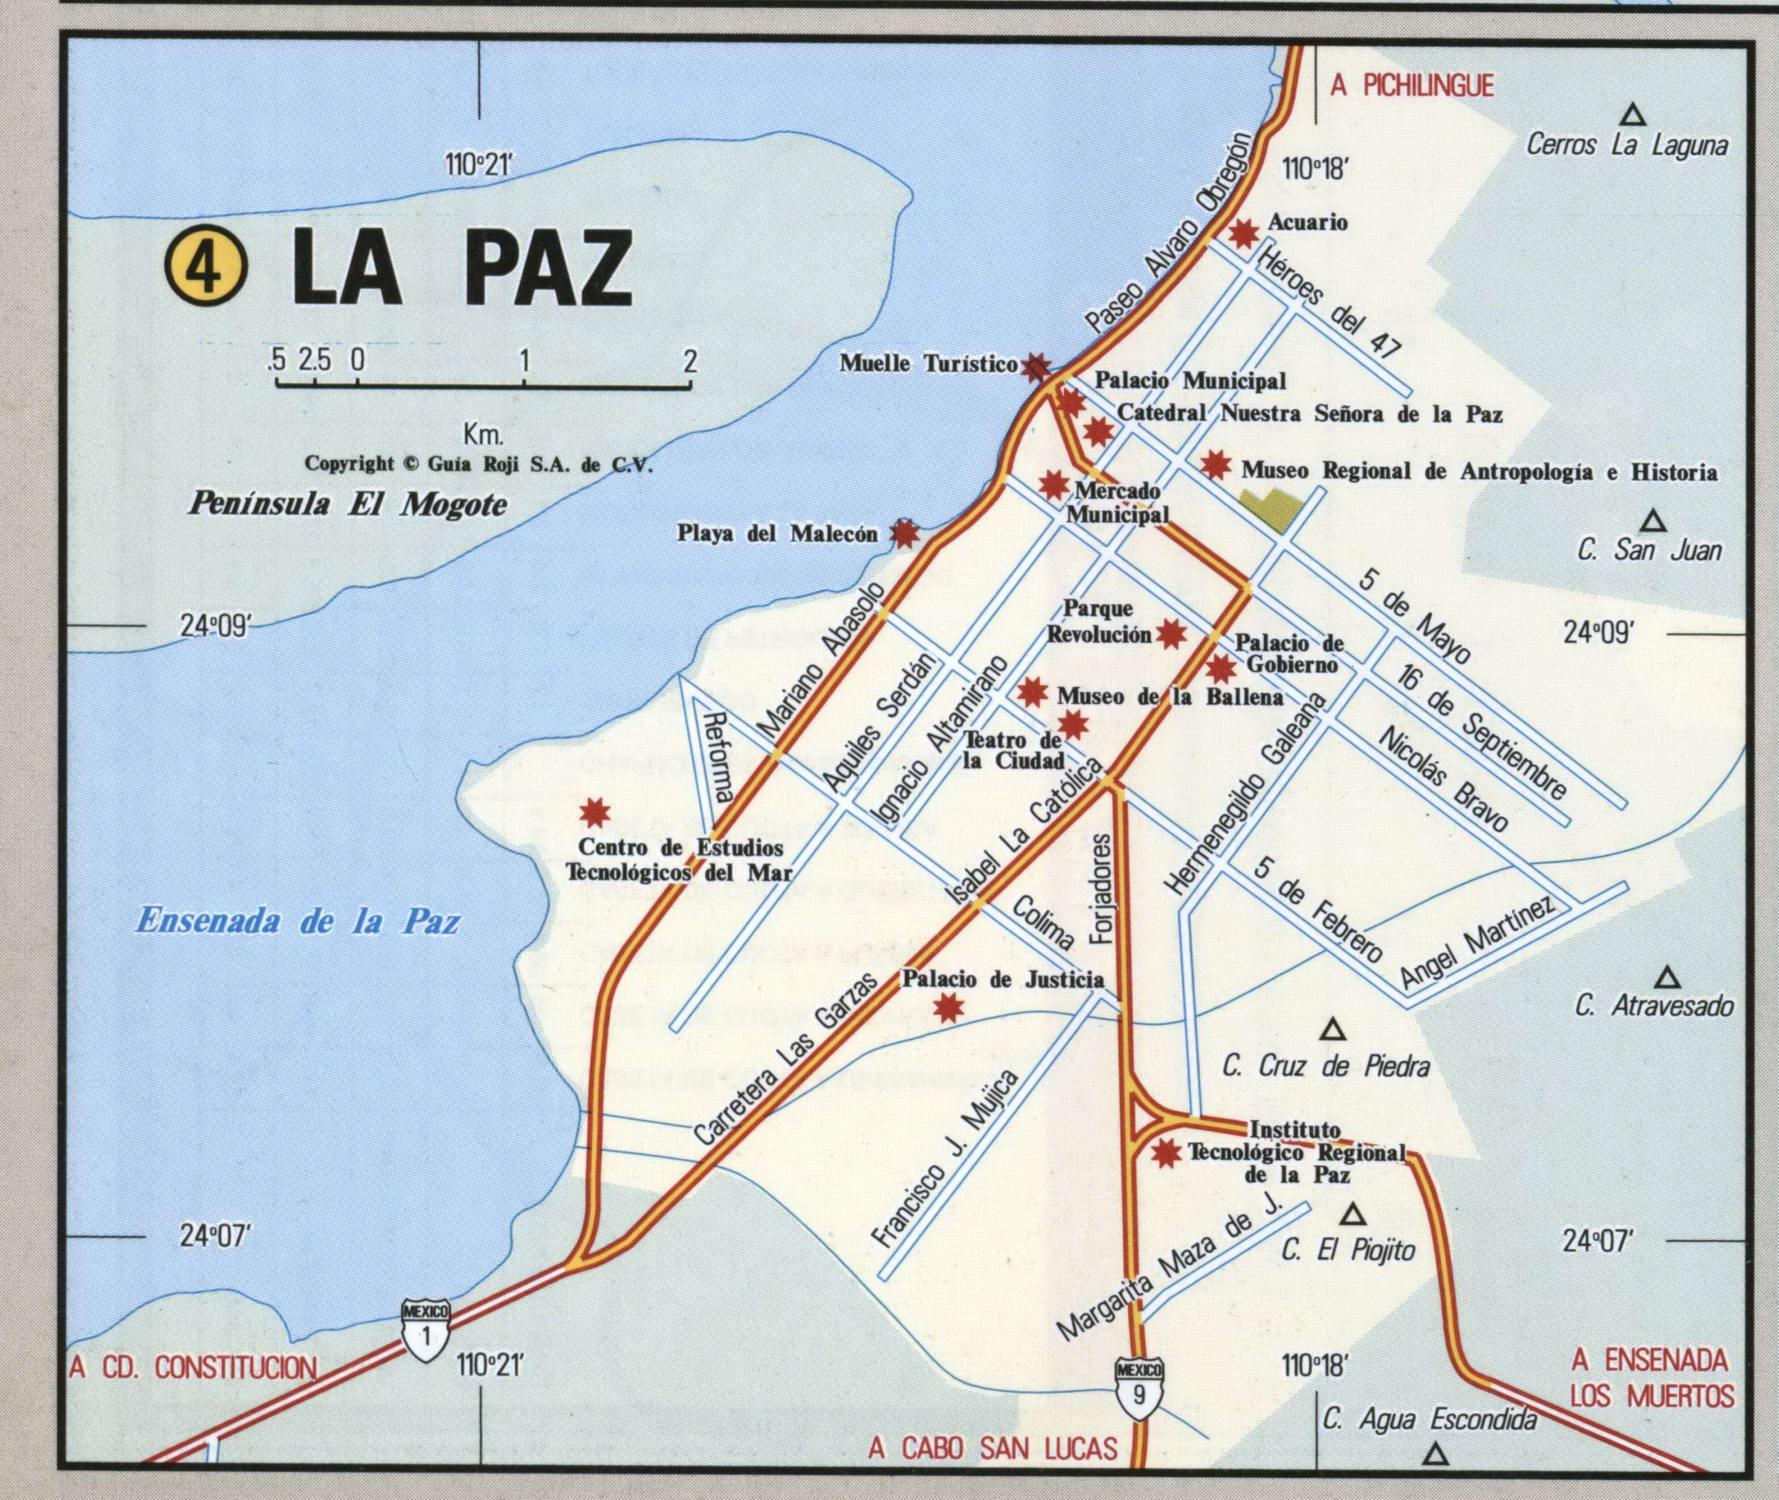 La Paz Baja California Map - Klipy - La Paz Baja California Map